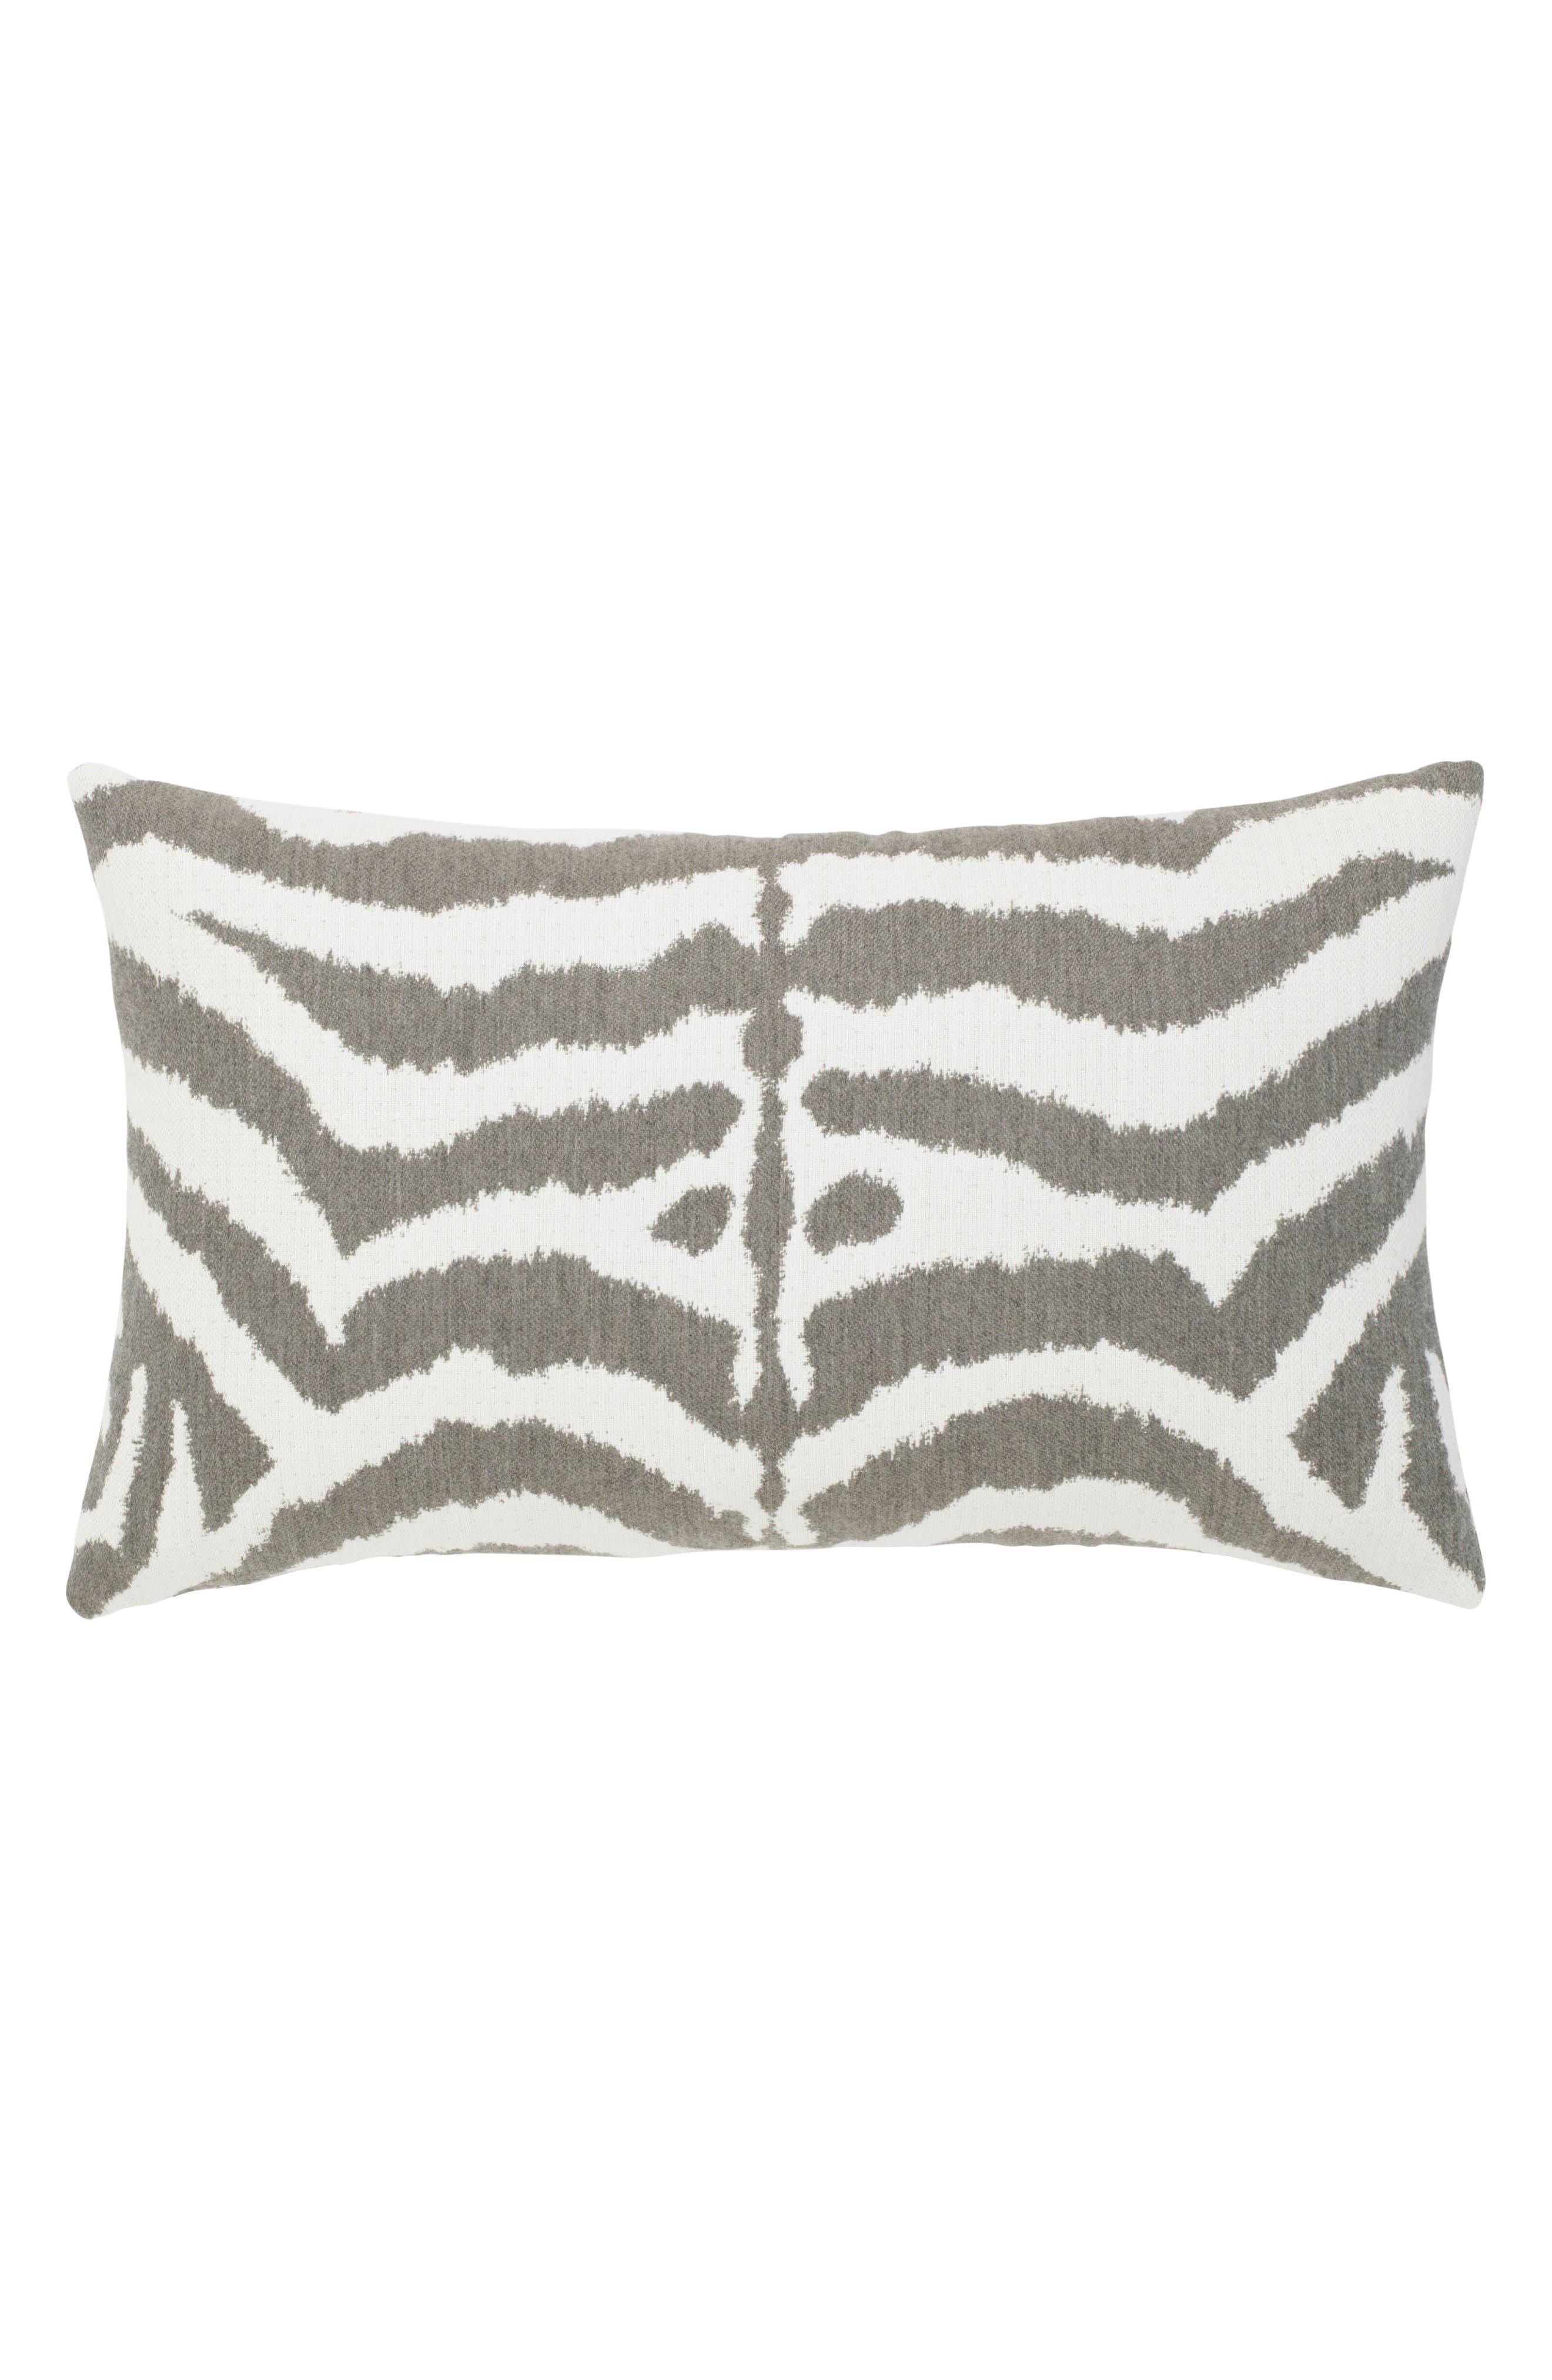 Main Image - Elaine Smith Zebra Gray Indoor/Outdoor Accent Pillow